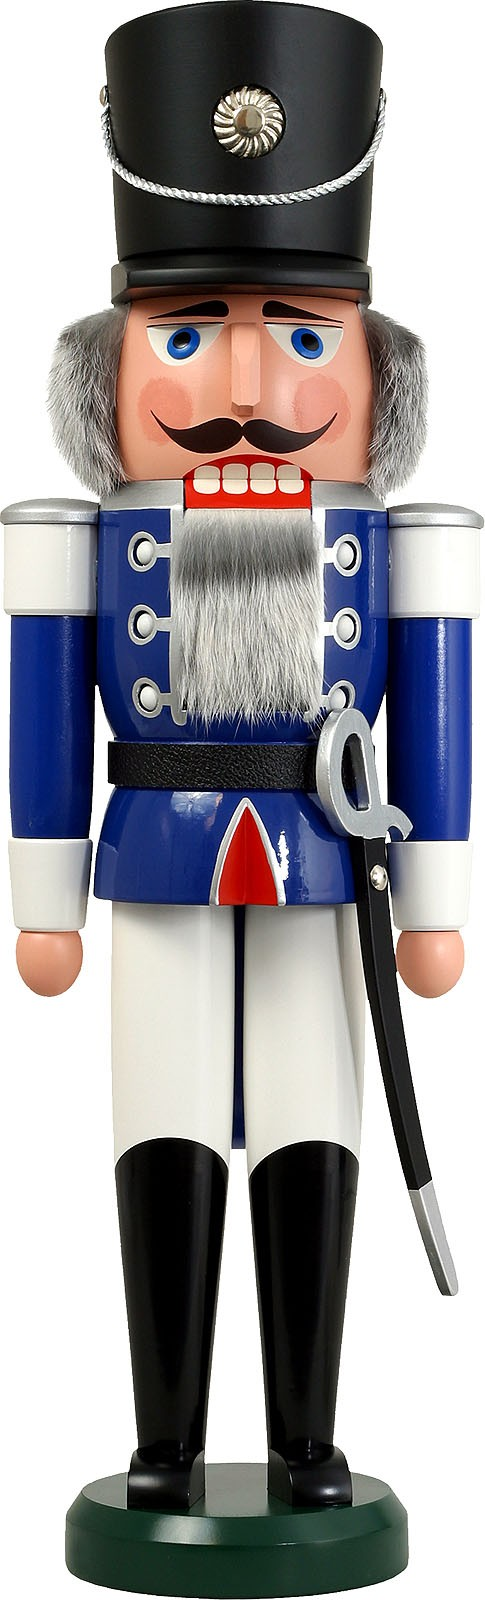 Nussknacker Husar, blau, 60 cm